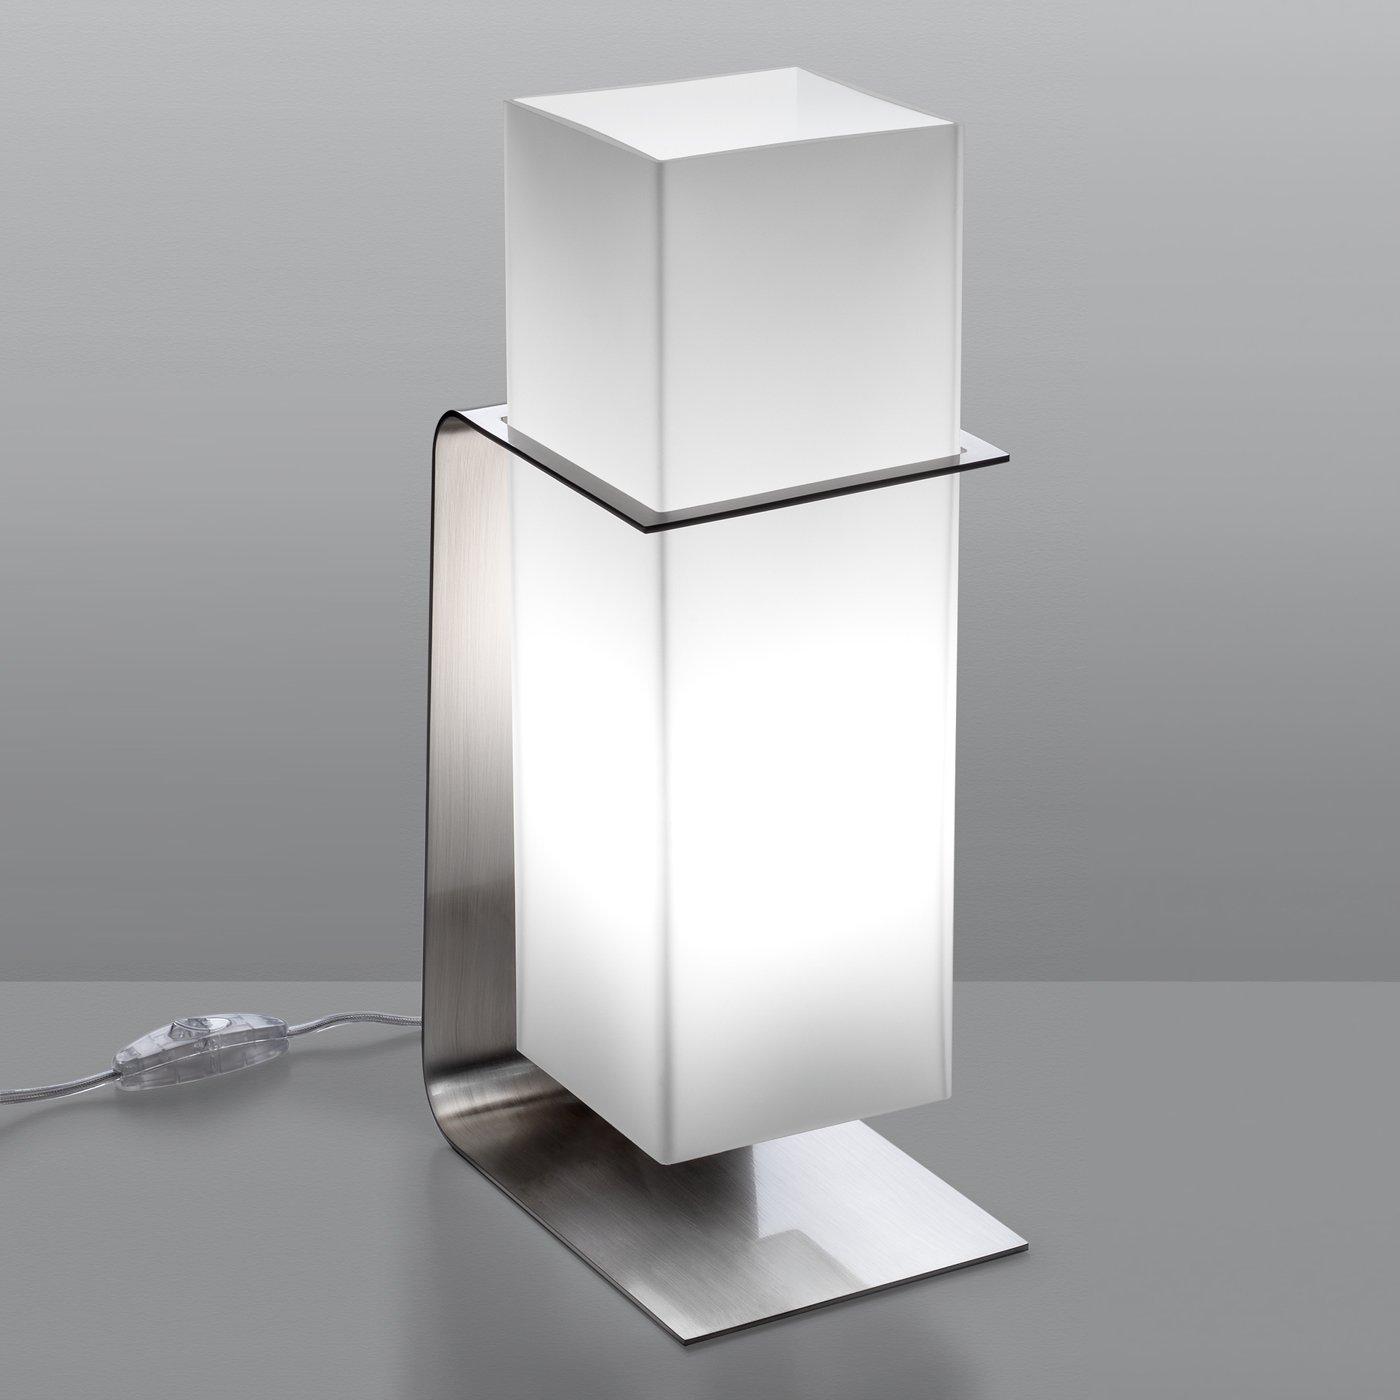 Table Lights For Bedroom Best Table Lamps 10 Lamps To Enlighten Your Life Warisan Lighting